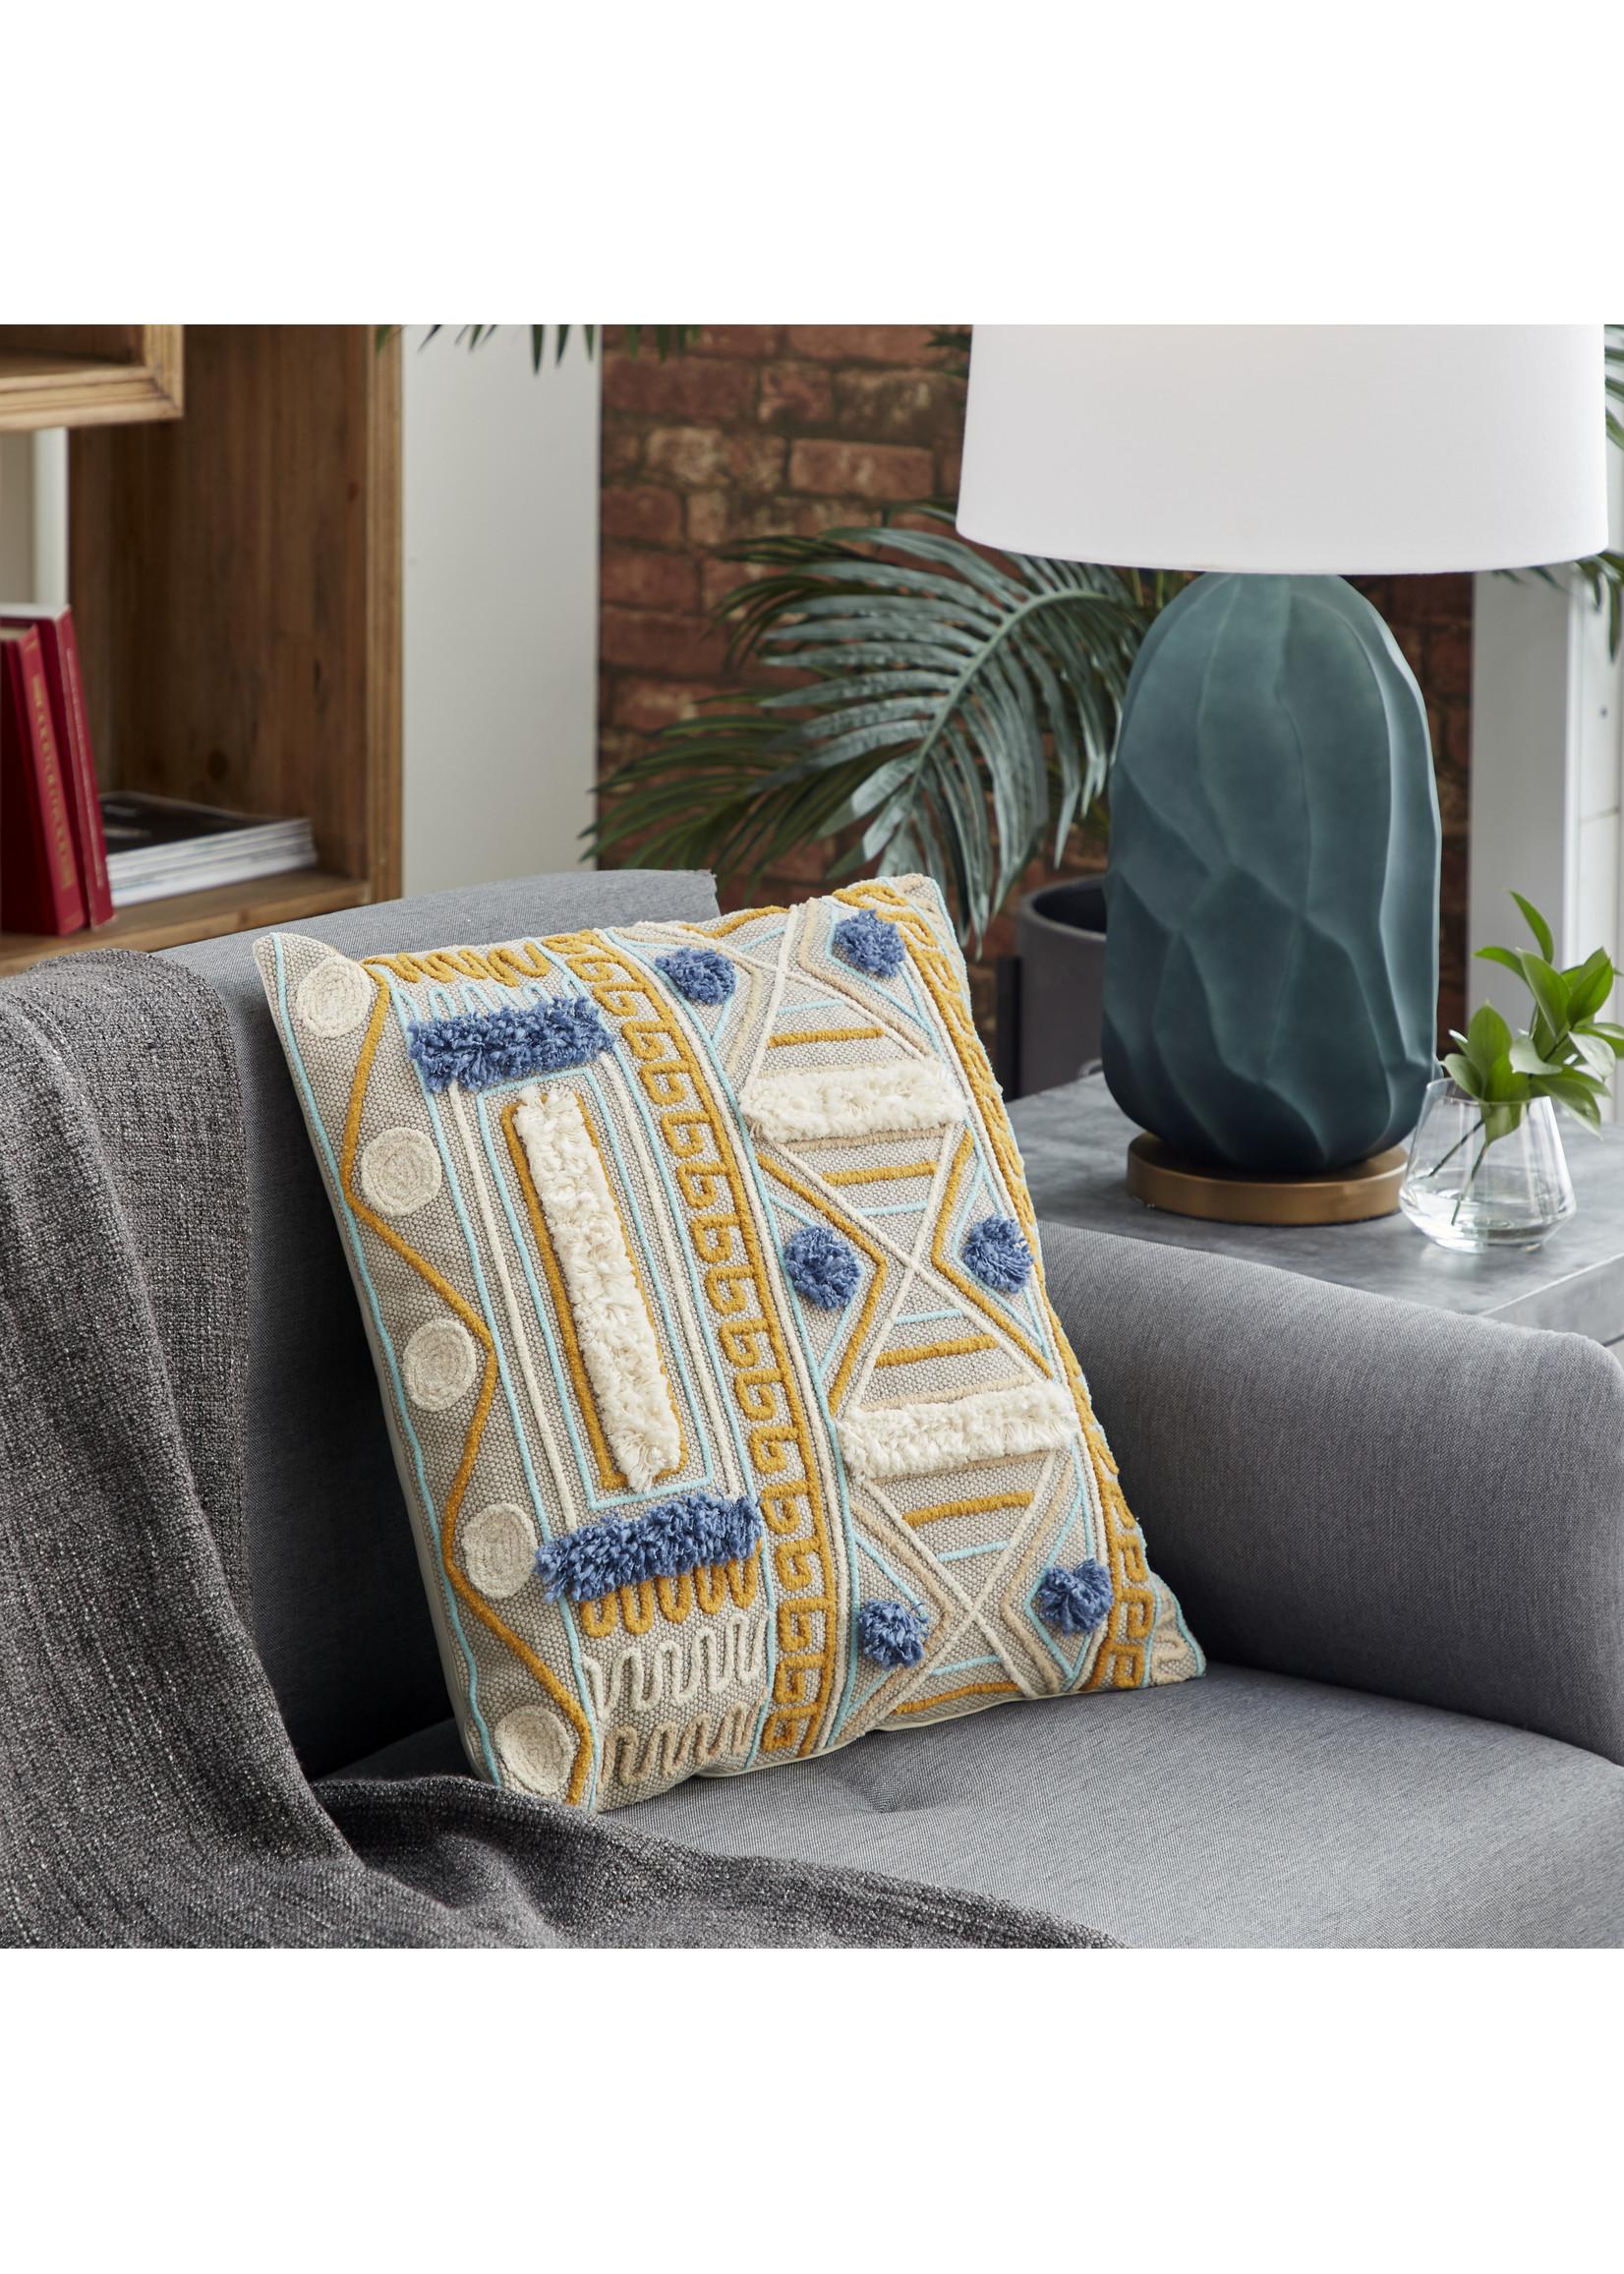 UMA Enterprises Textured Cotton Pillows Navaho Design